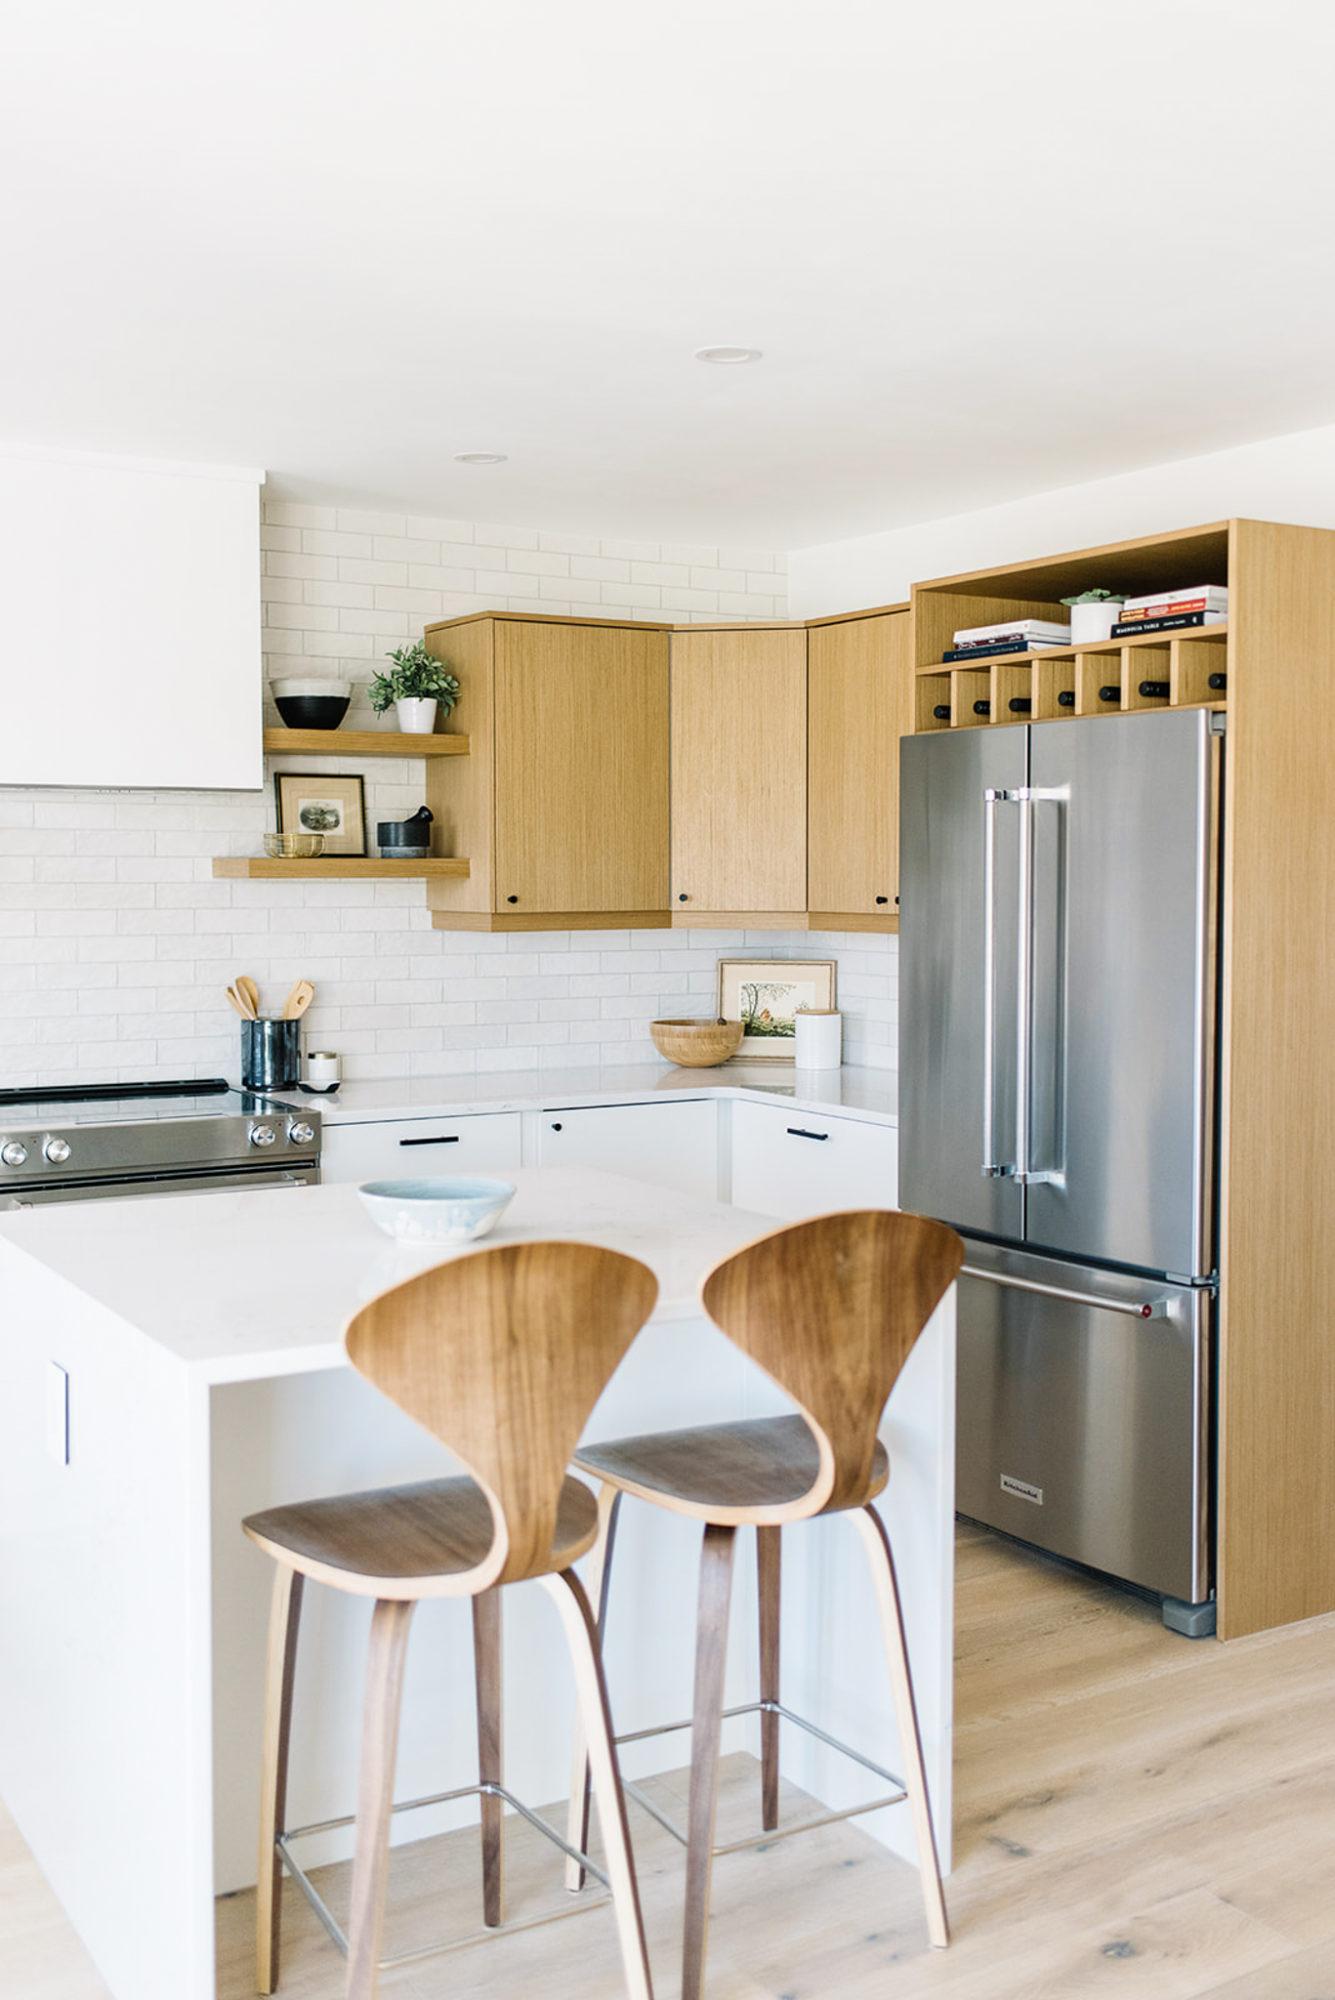 kitchen reno countertop options 101 choosing the right appliances kristina lynne ravine house one room challenge design